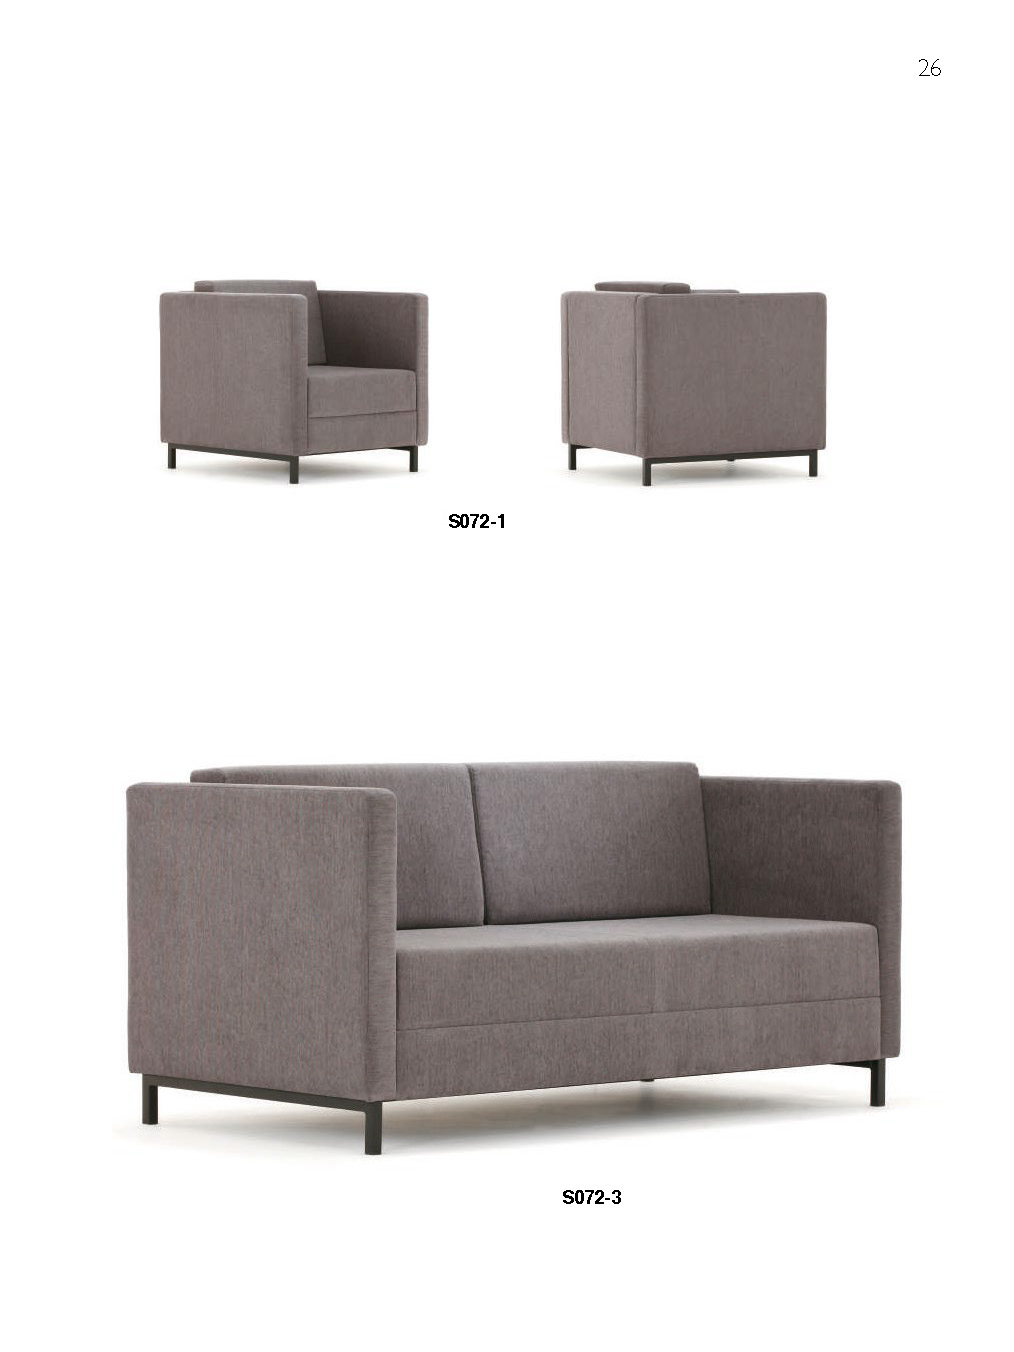 Top Furniture Catalog 2019_Page_26.jpg